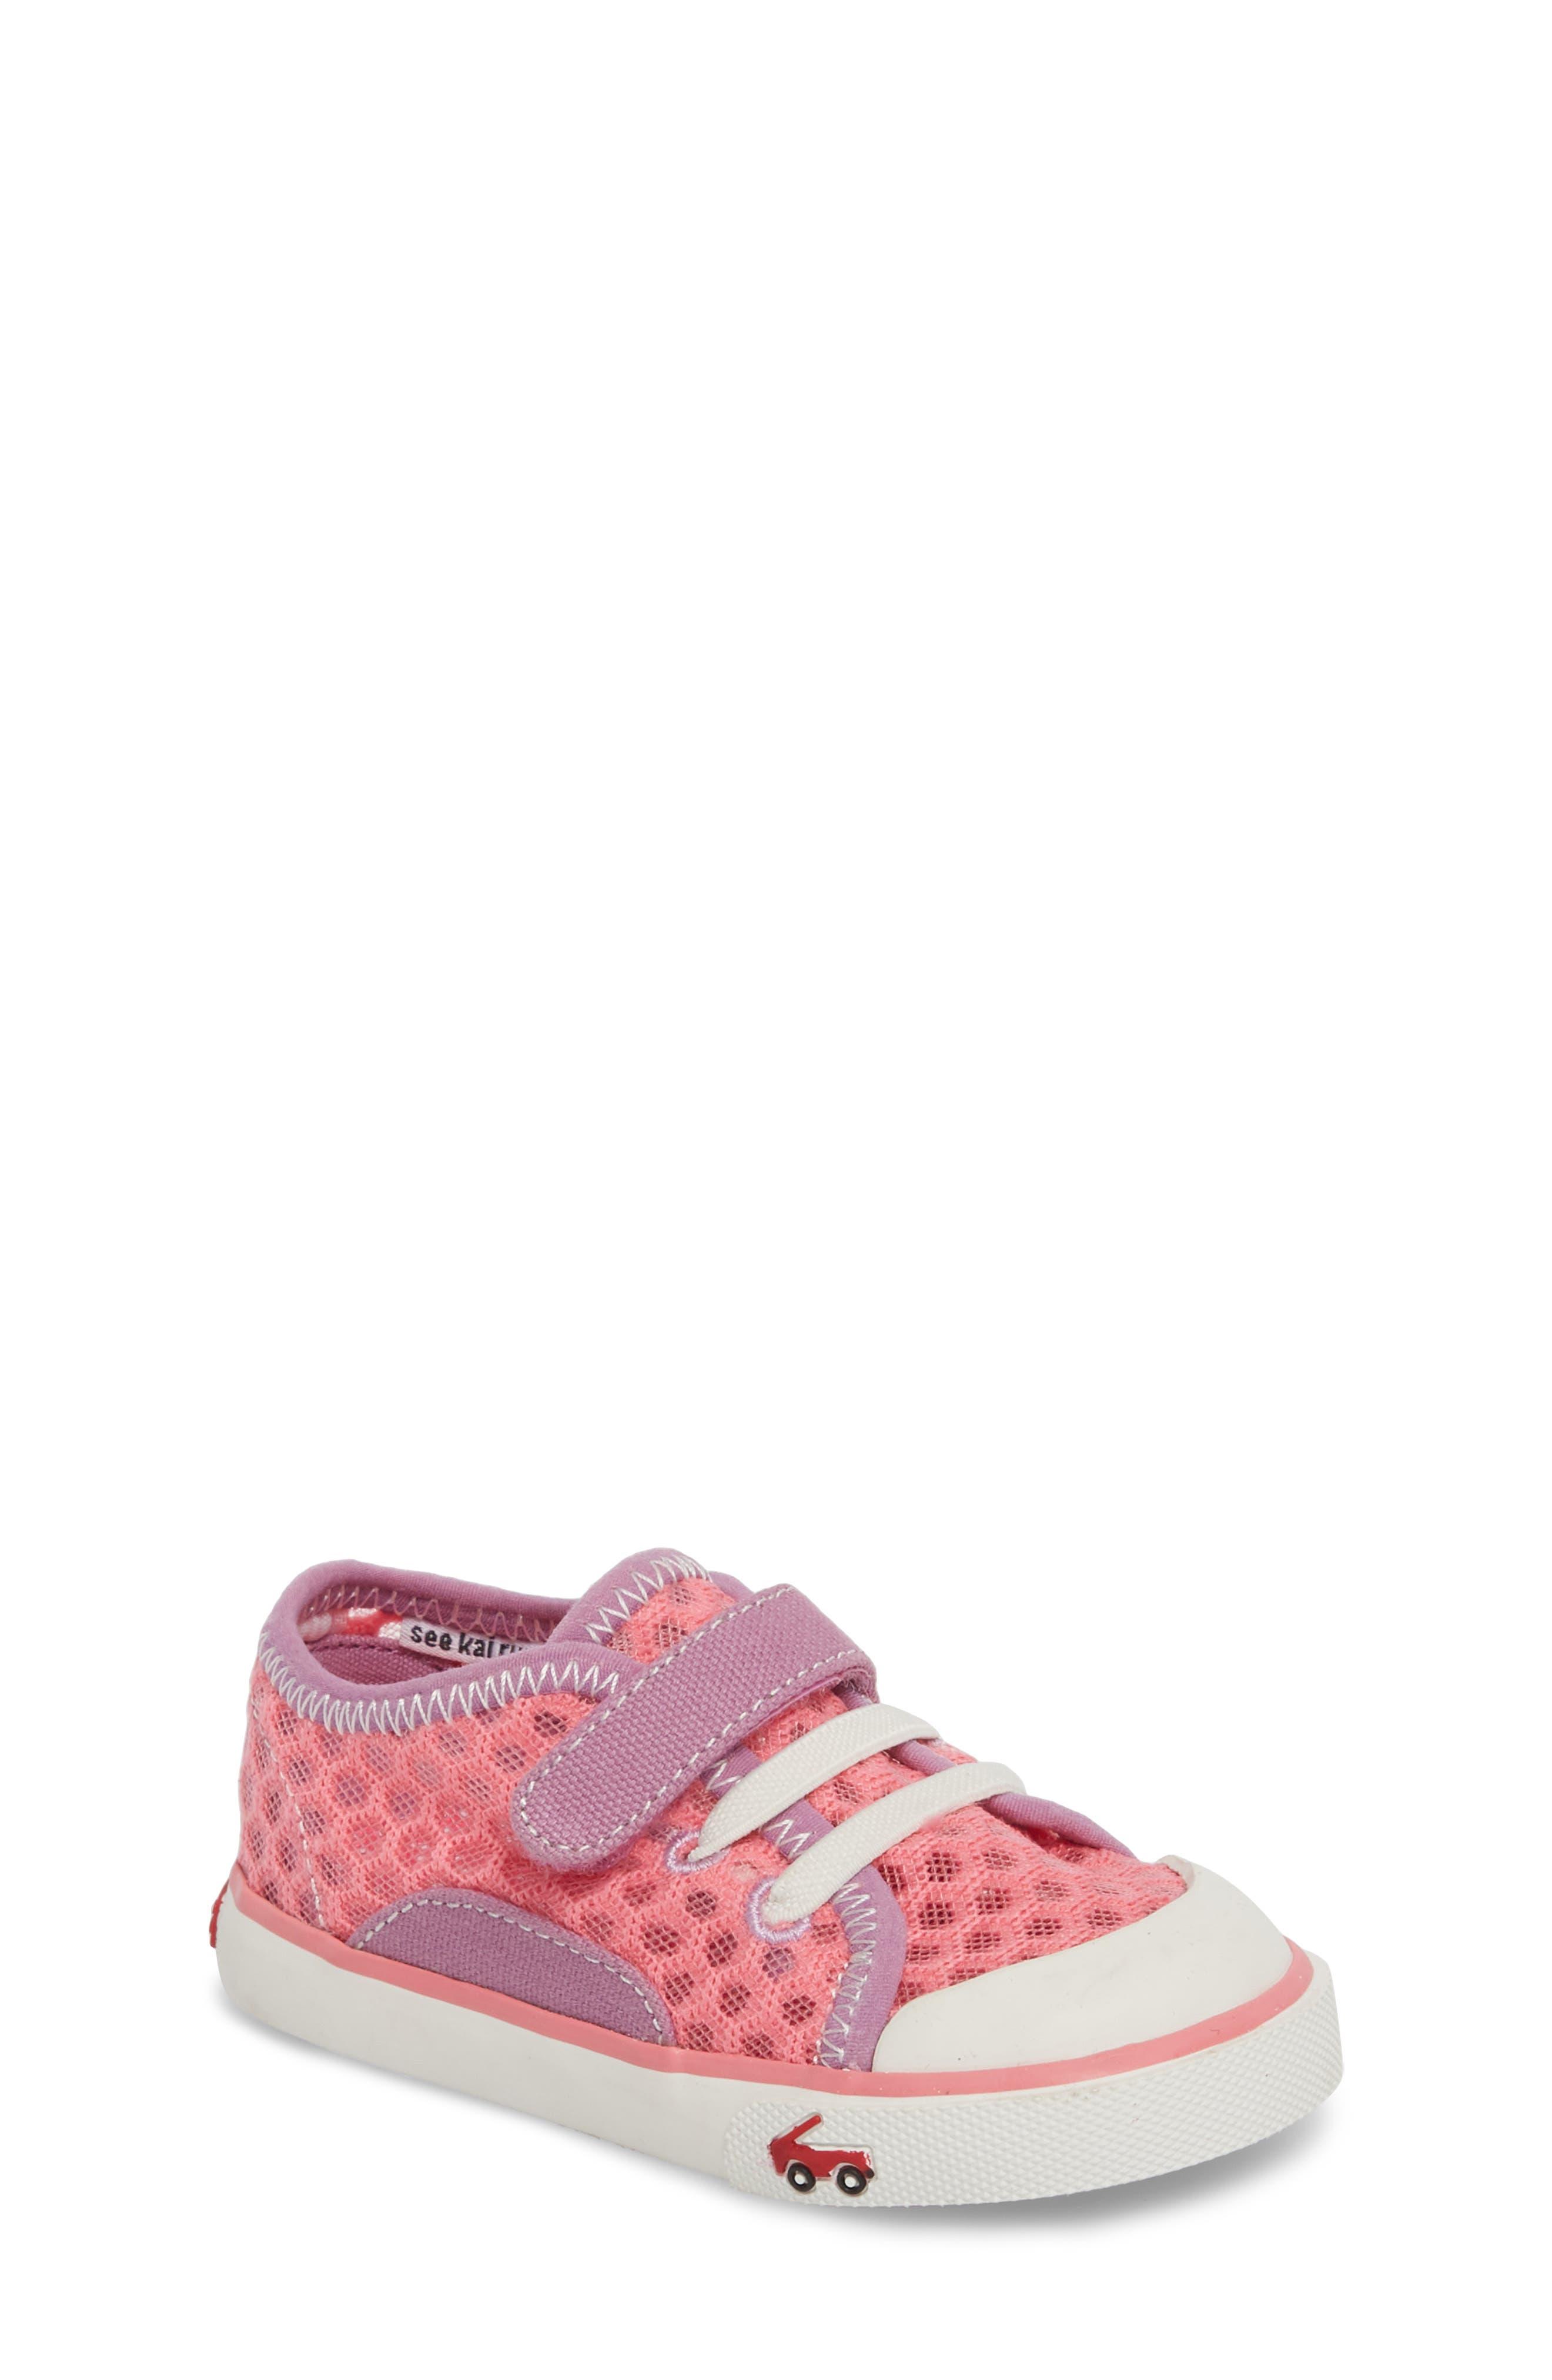 Saylor Sneaker,                             Main thumbnail 1, color,                             670